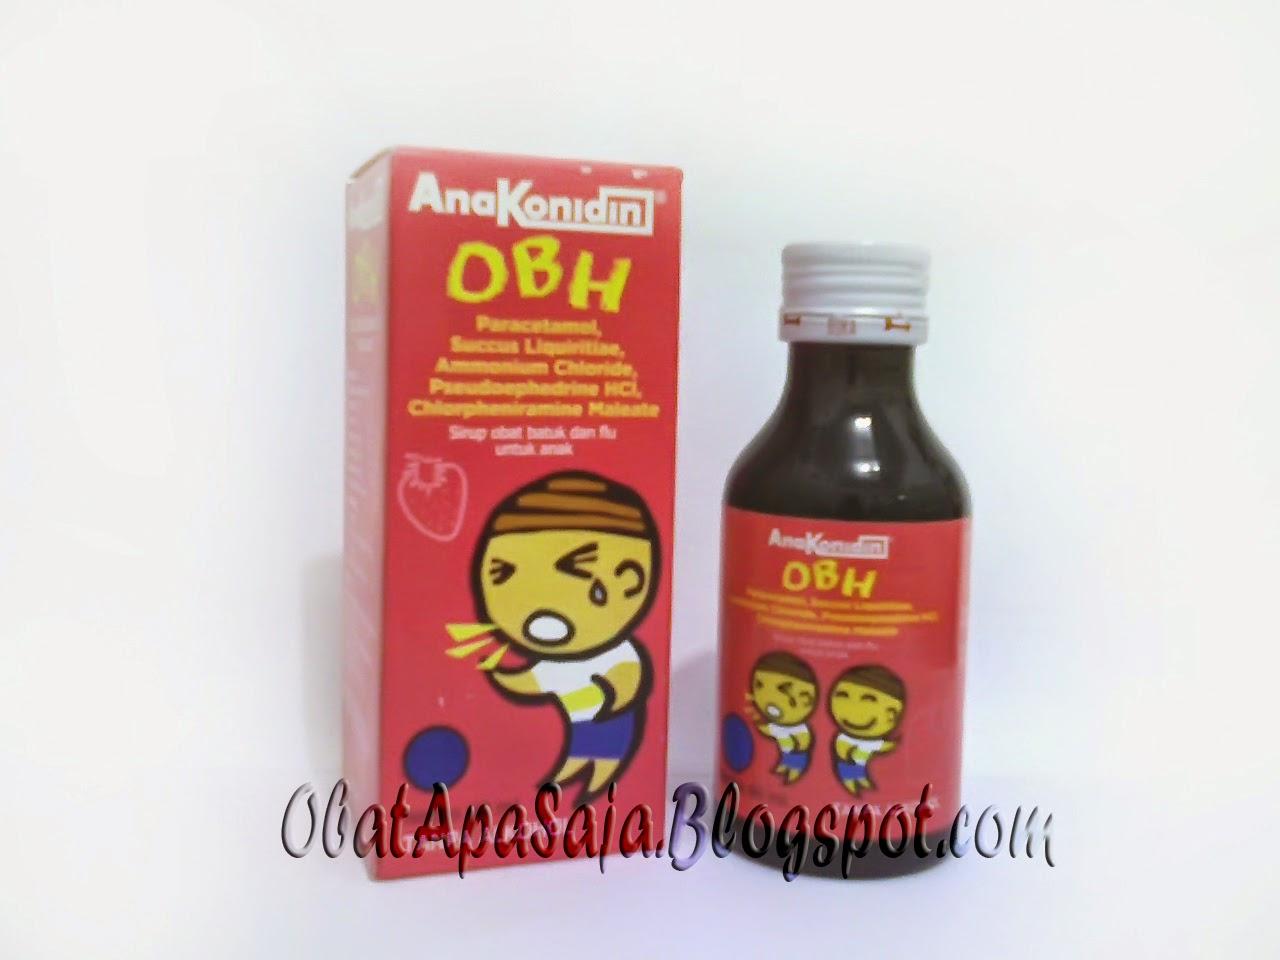 AnaKonidin OBH Sirup Obat Batuk Plus Flu untuk Anak